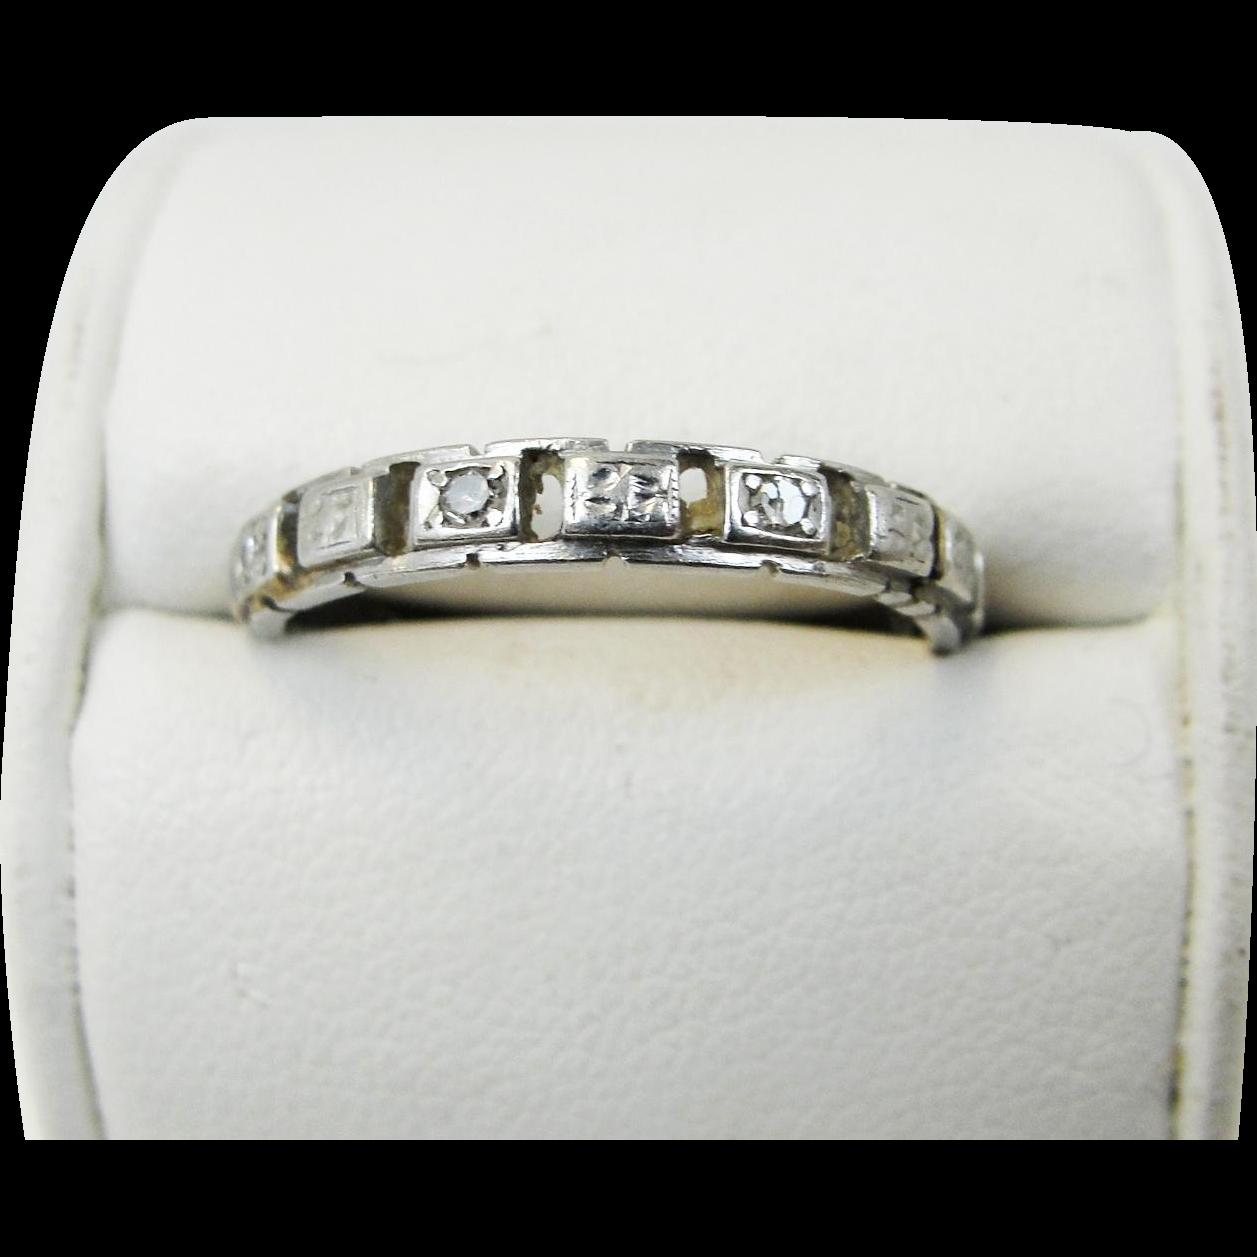 Vintage Edwardian 3mm Platinum Diamond Wedding Band Ring Openwork ...